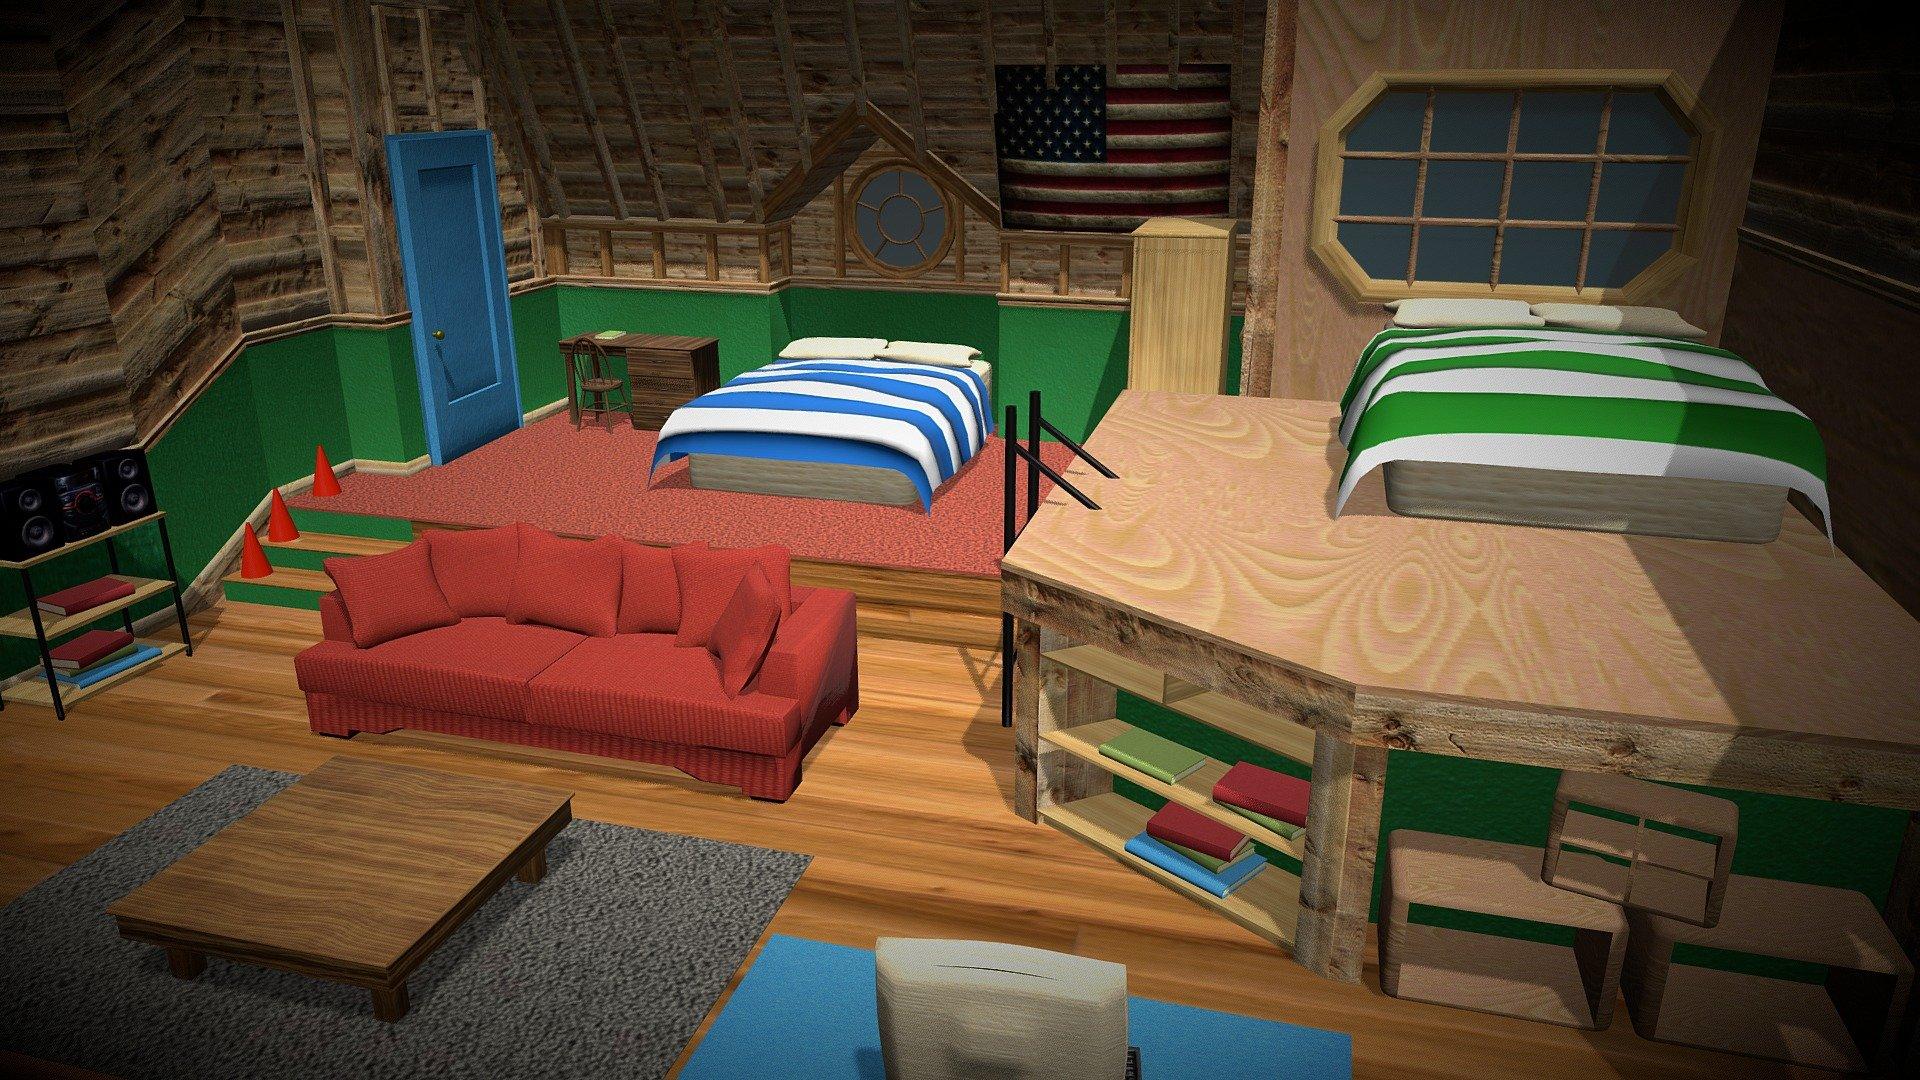 drake & josh's bedroom - 3d modeldazzler (@dazzler